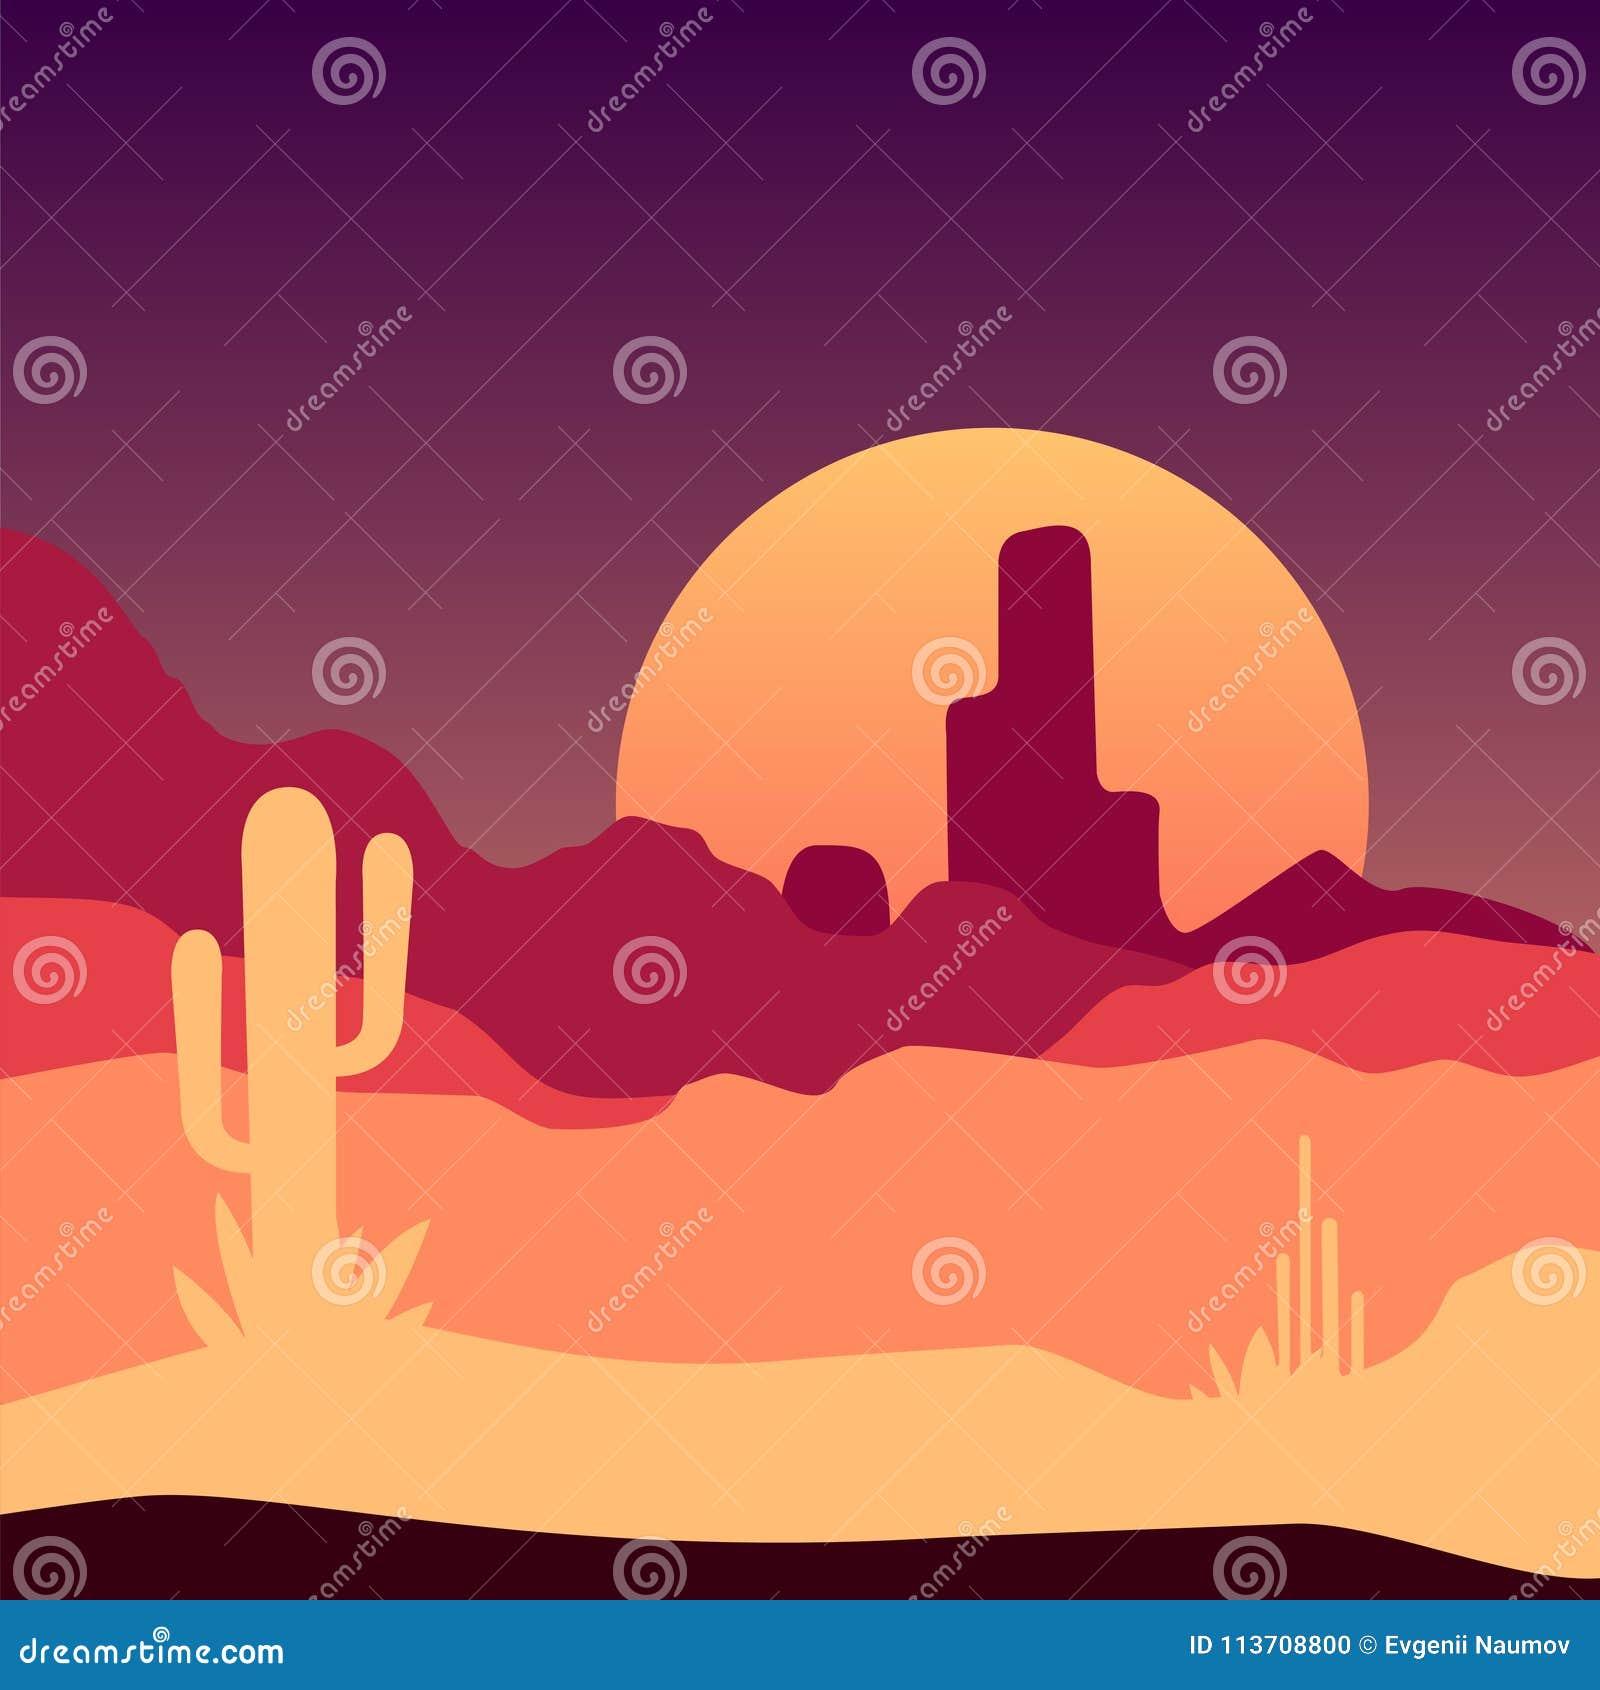 sunrise in mexican desert landscape with cactus plants and rocky rh dreamstime com Beach Clip Art Cartoon Sunrise Clip Art